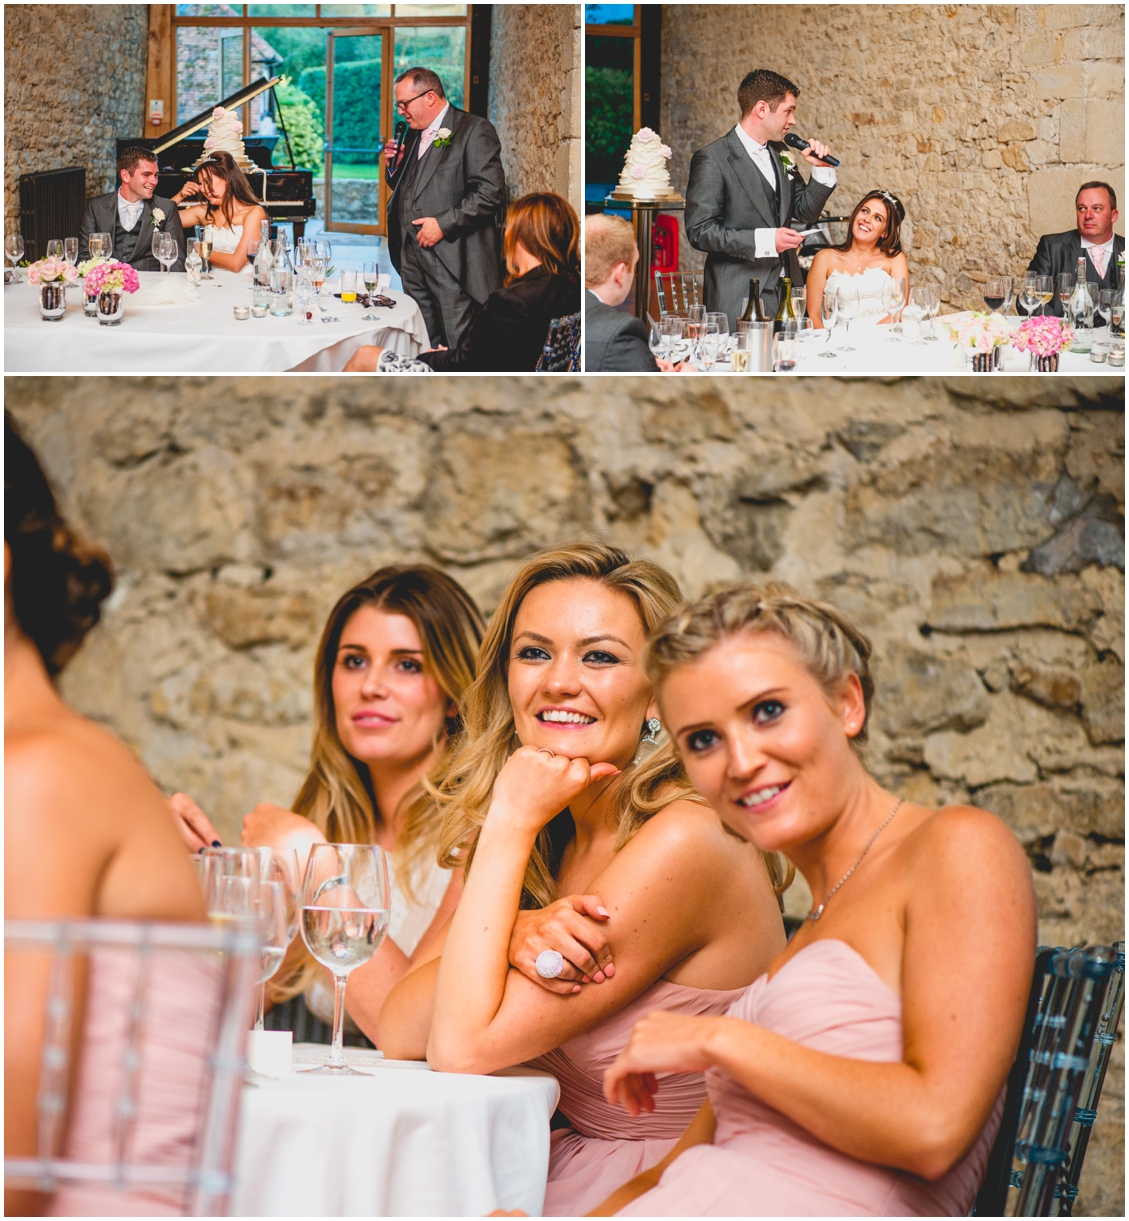 Notley Abbey, speeches, Wedding Photography, Lisa Carpenter Photography, photos, Oxfordshire, West Midlands